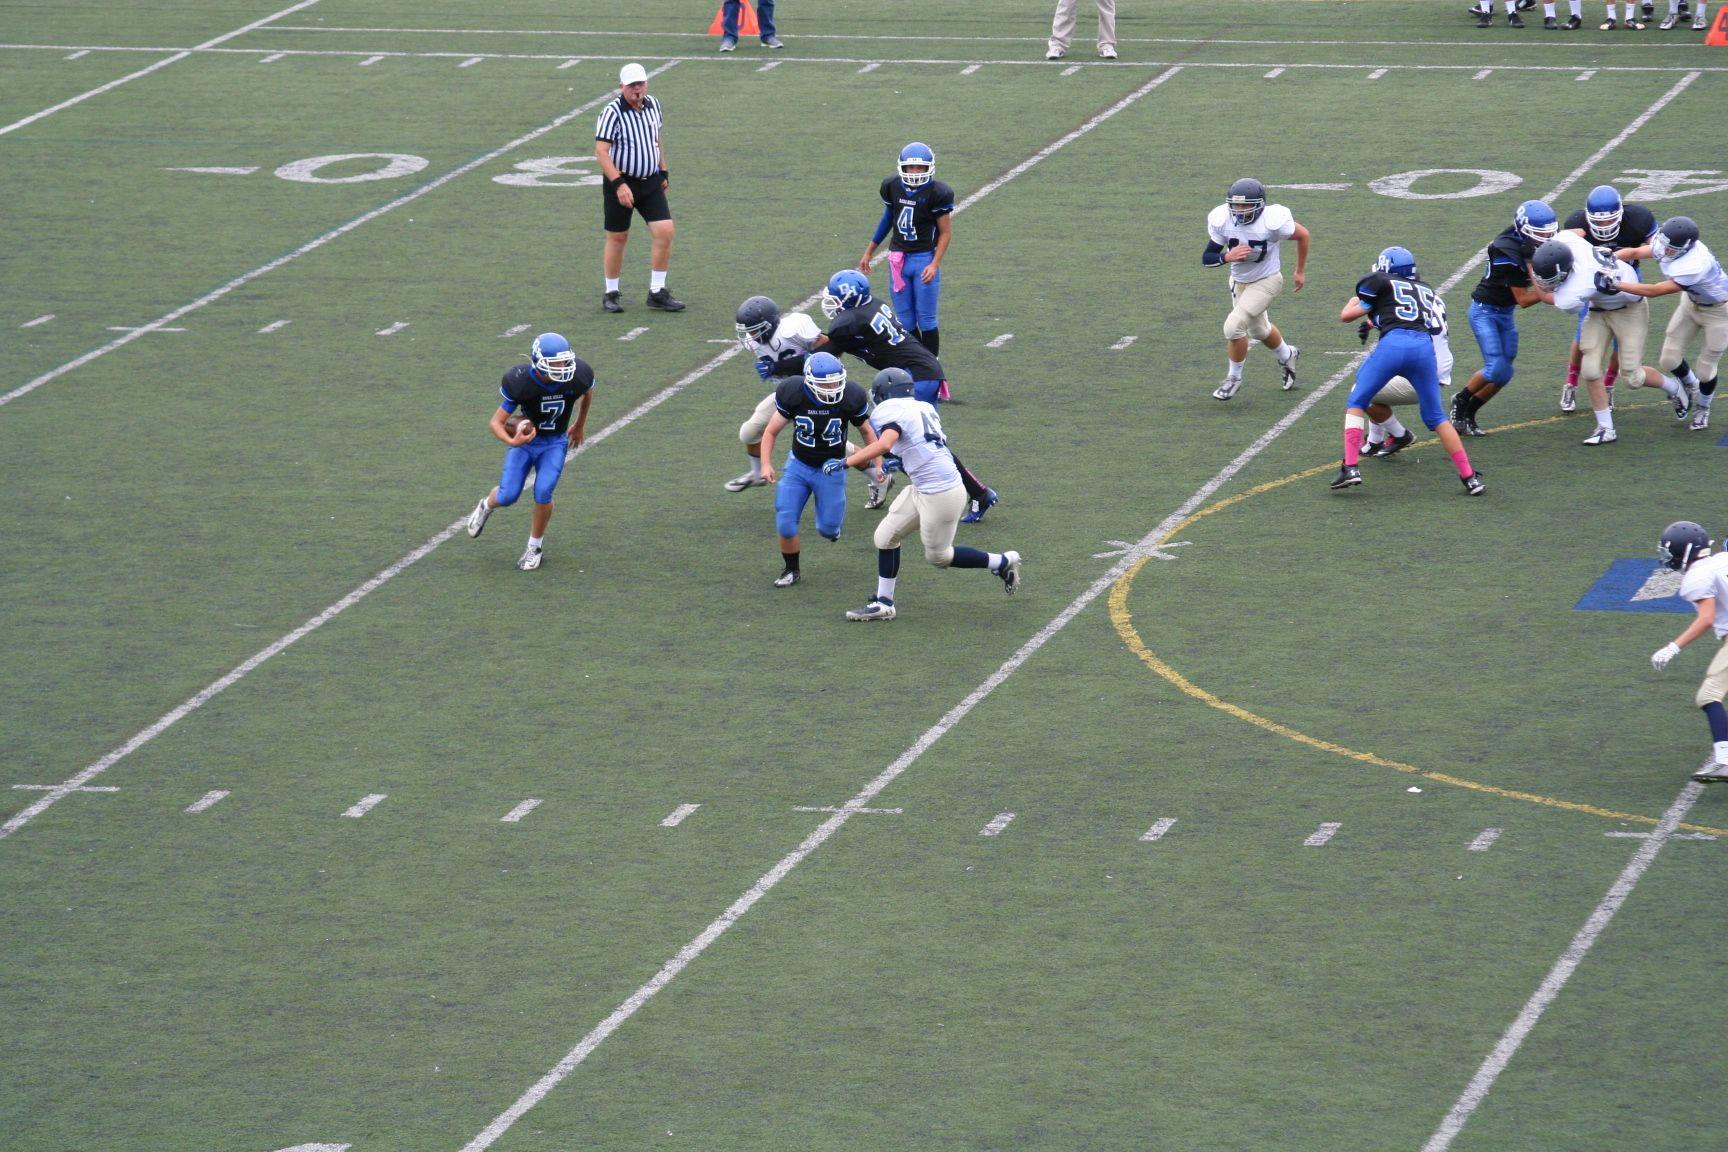 Dana Hills High School Football High School Football Dolphins Football Football